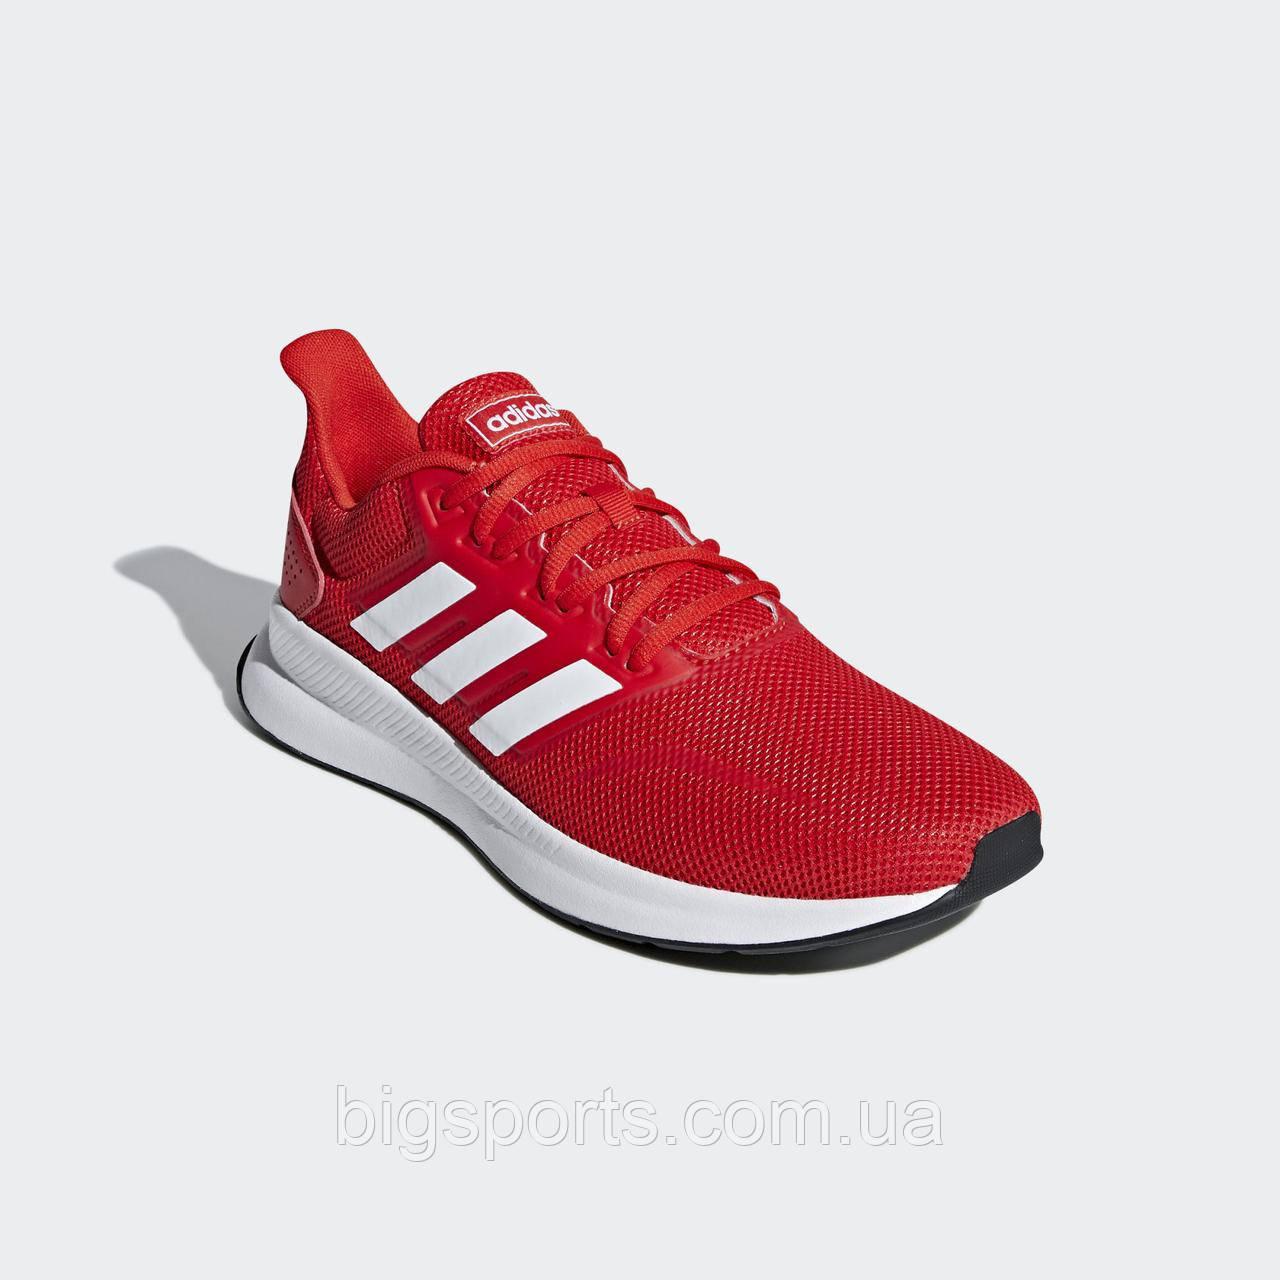 Кроссовки муж. Adidas Runfalcon (арт. F36202)